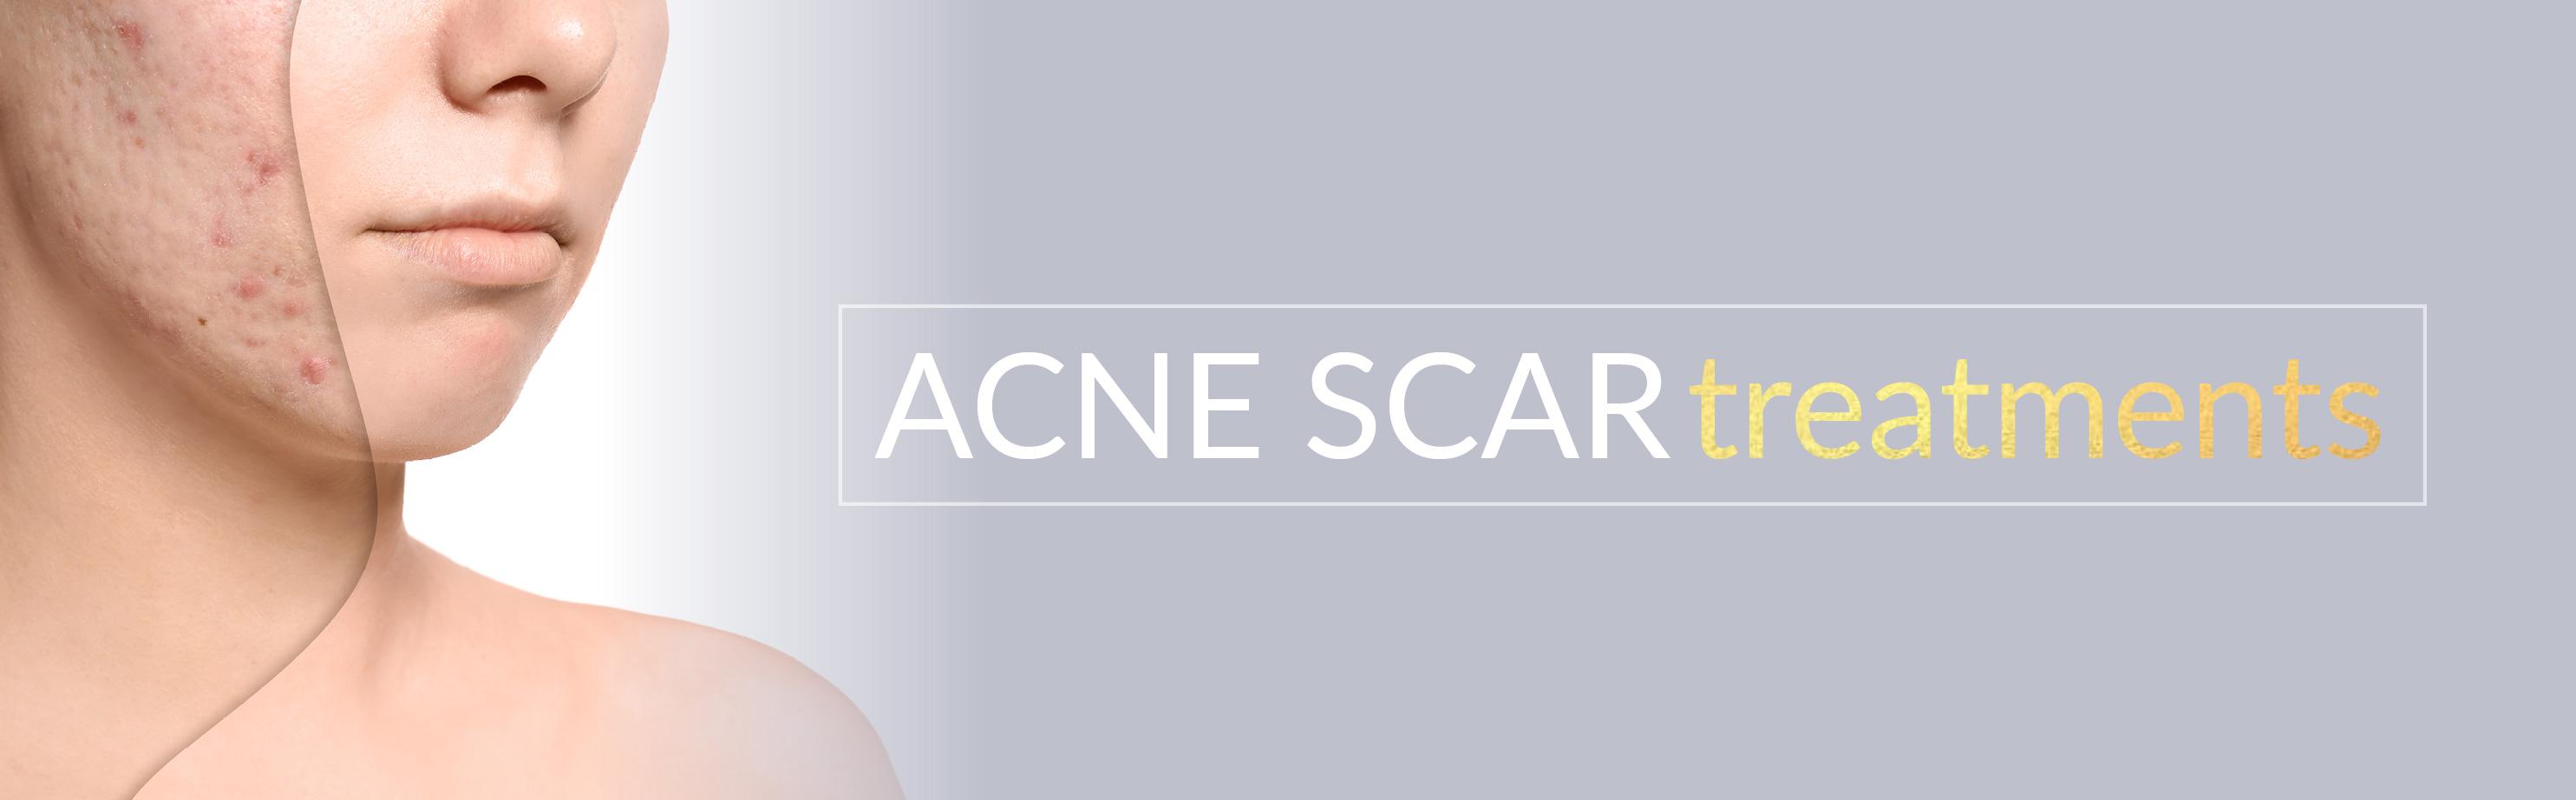 acne-scar-treatments-banner